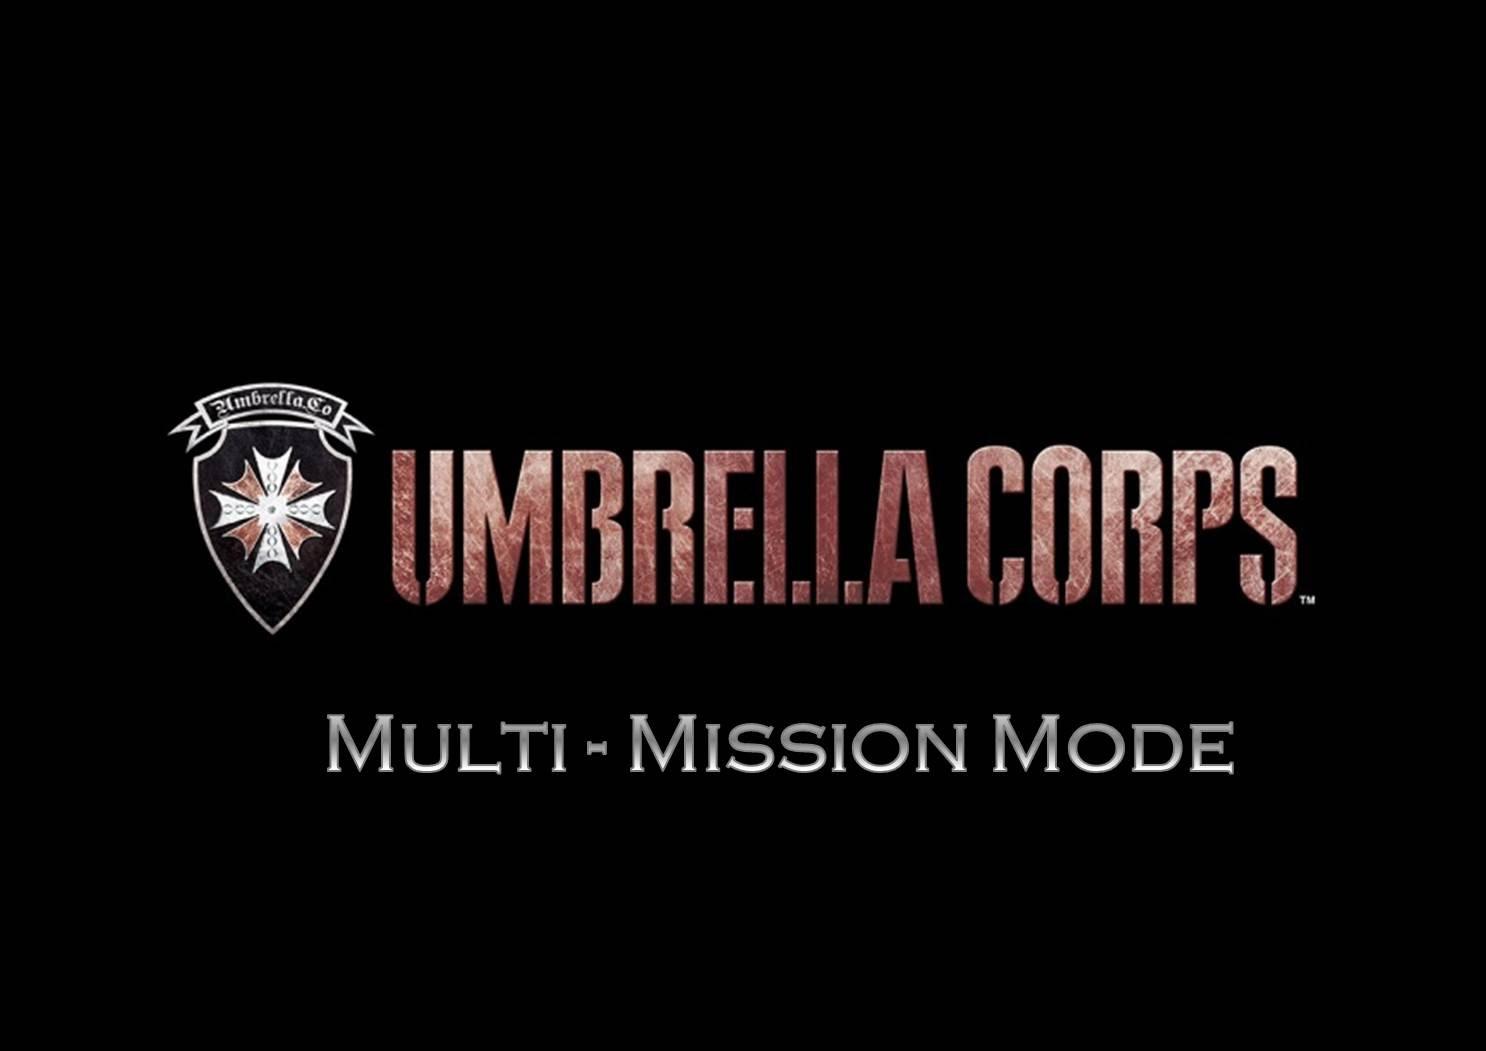 UMBRELLA CORPS - Introducing Multi-Mission Mode!